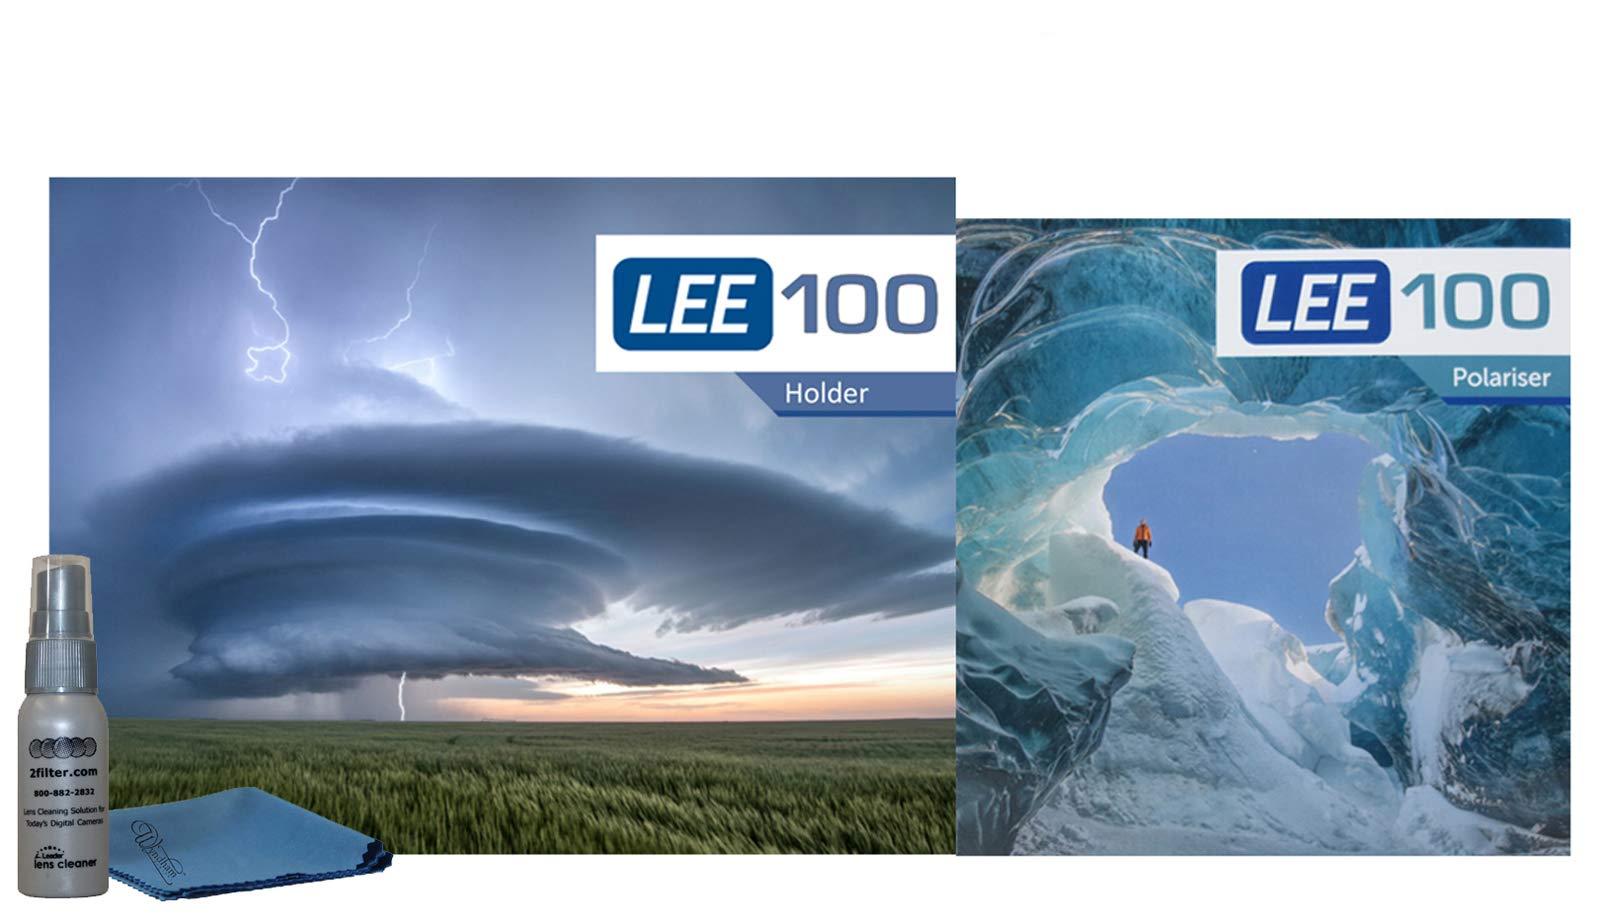 LEE Filters LEE100 Filter Holder and LEE Filters LEE100 Polarizer